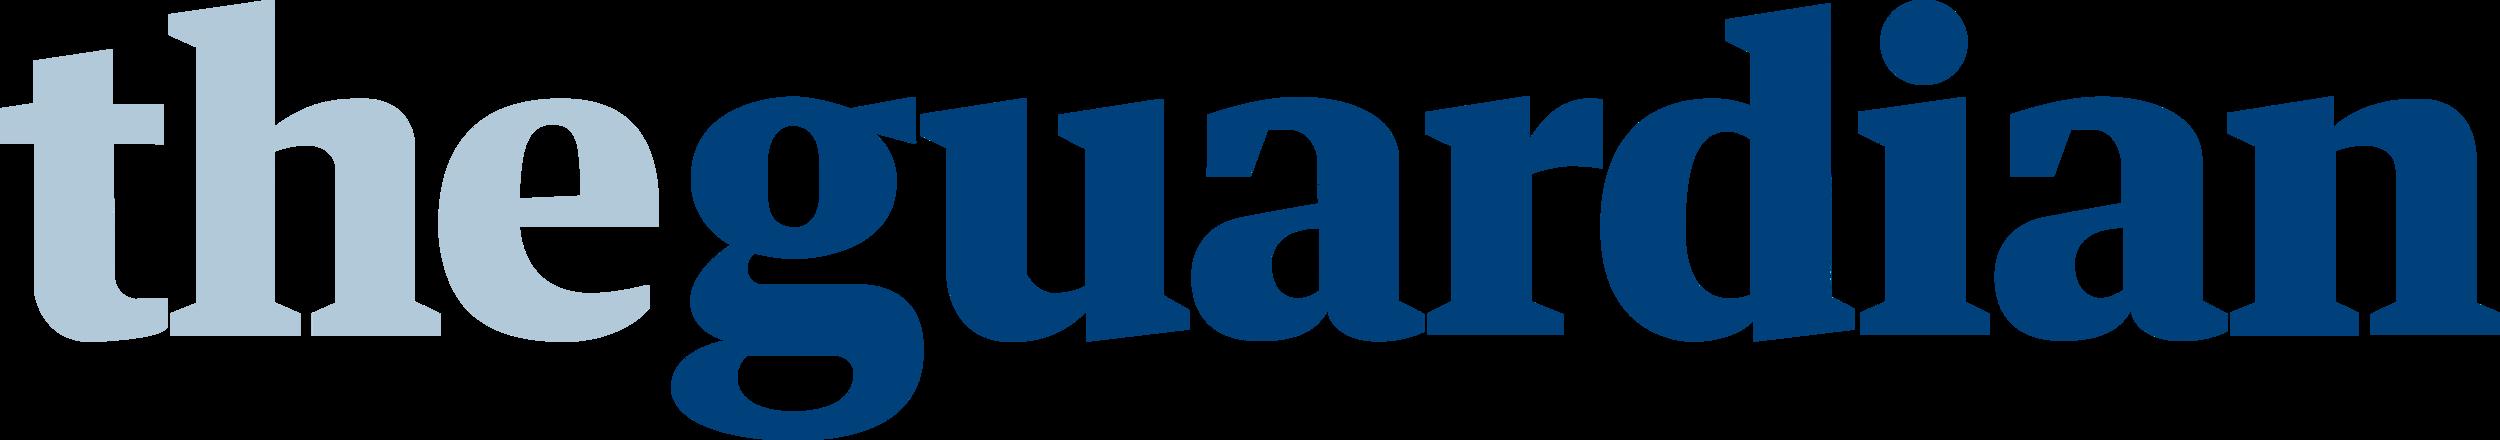 The_Guardian_logo_logotype.png